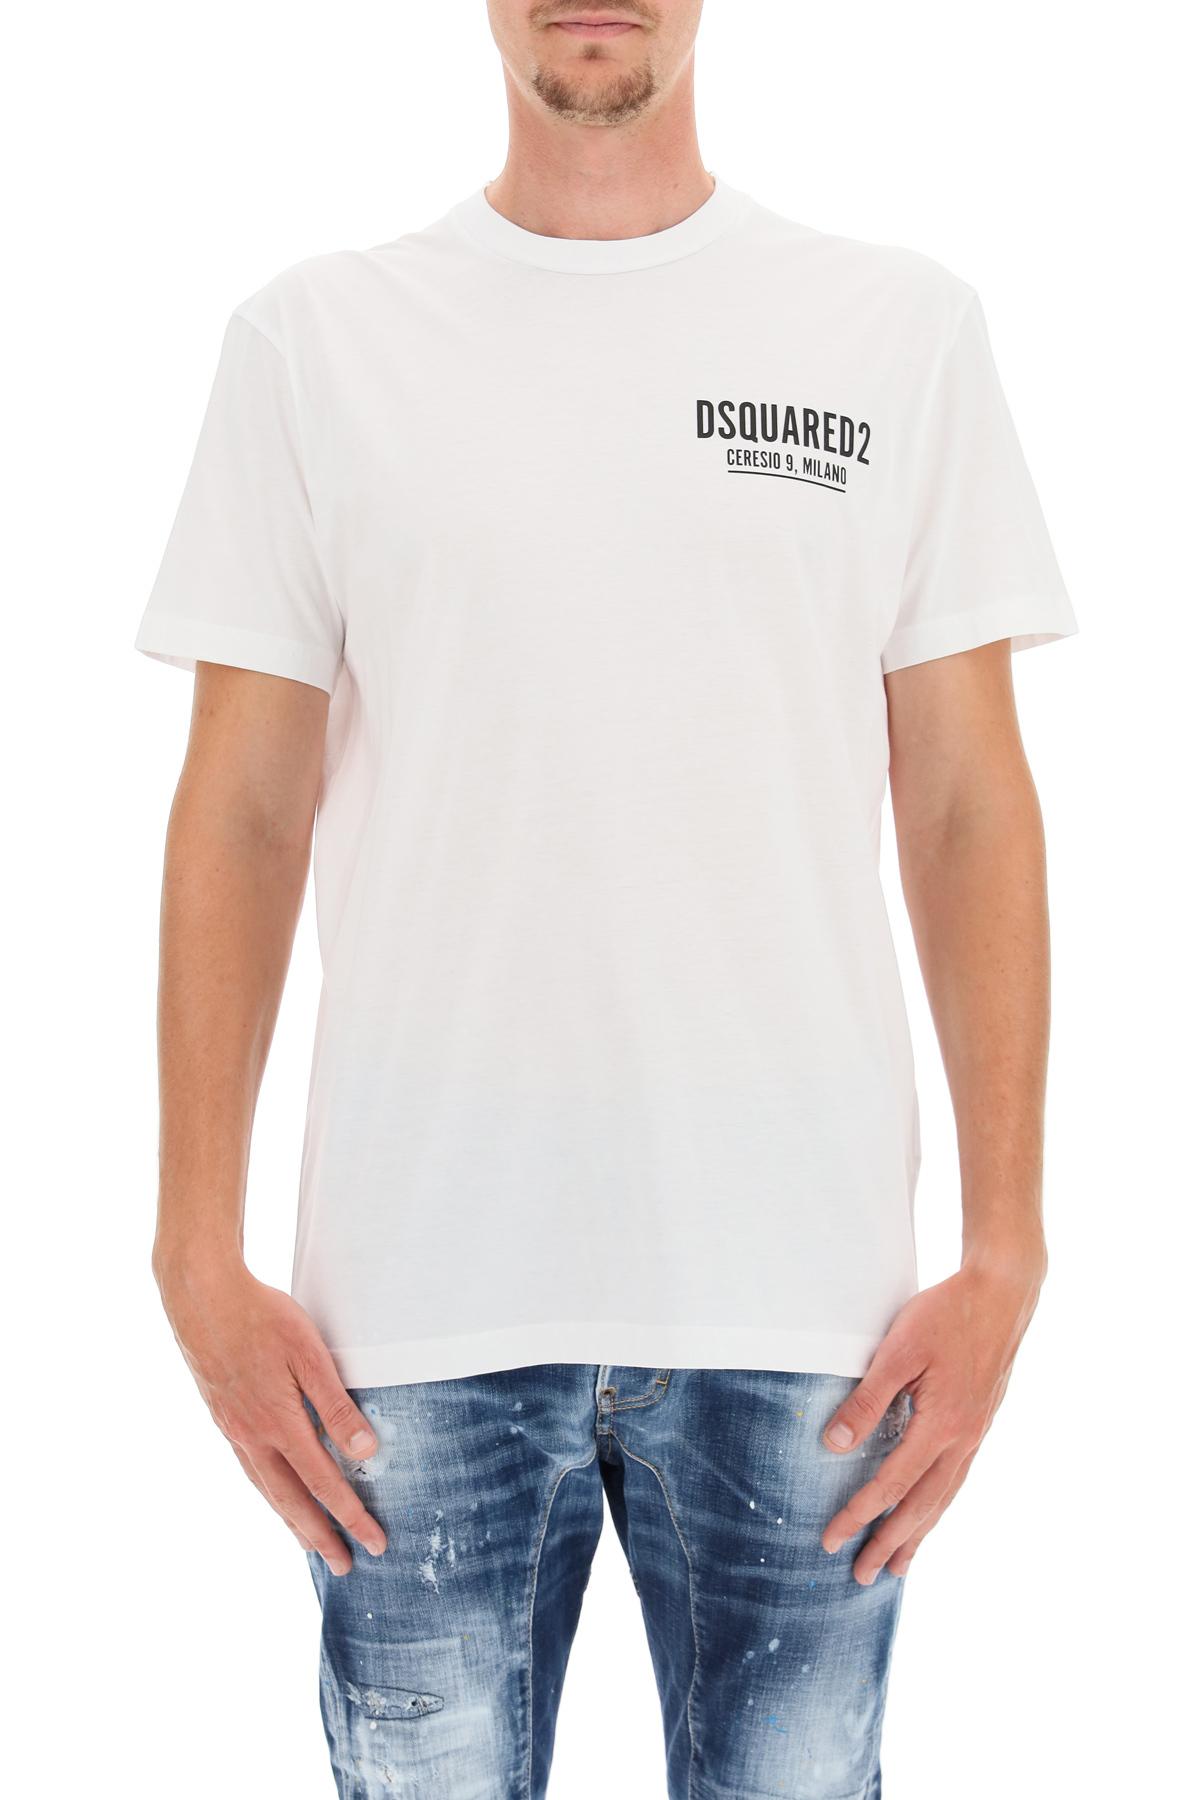 Dsquared2 t-shirt ceresio 9